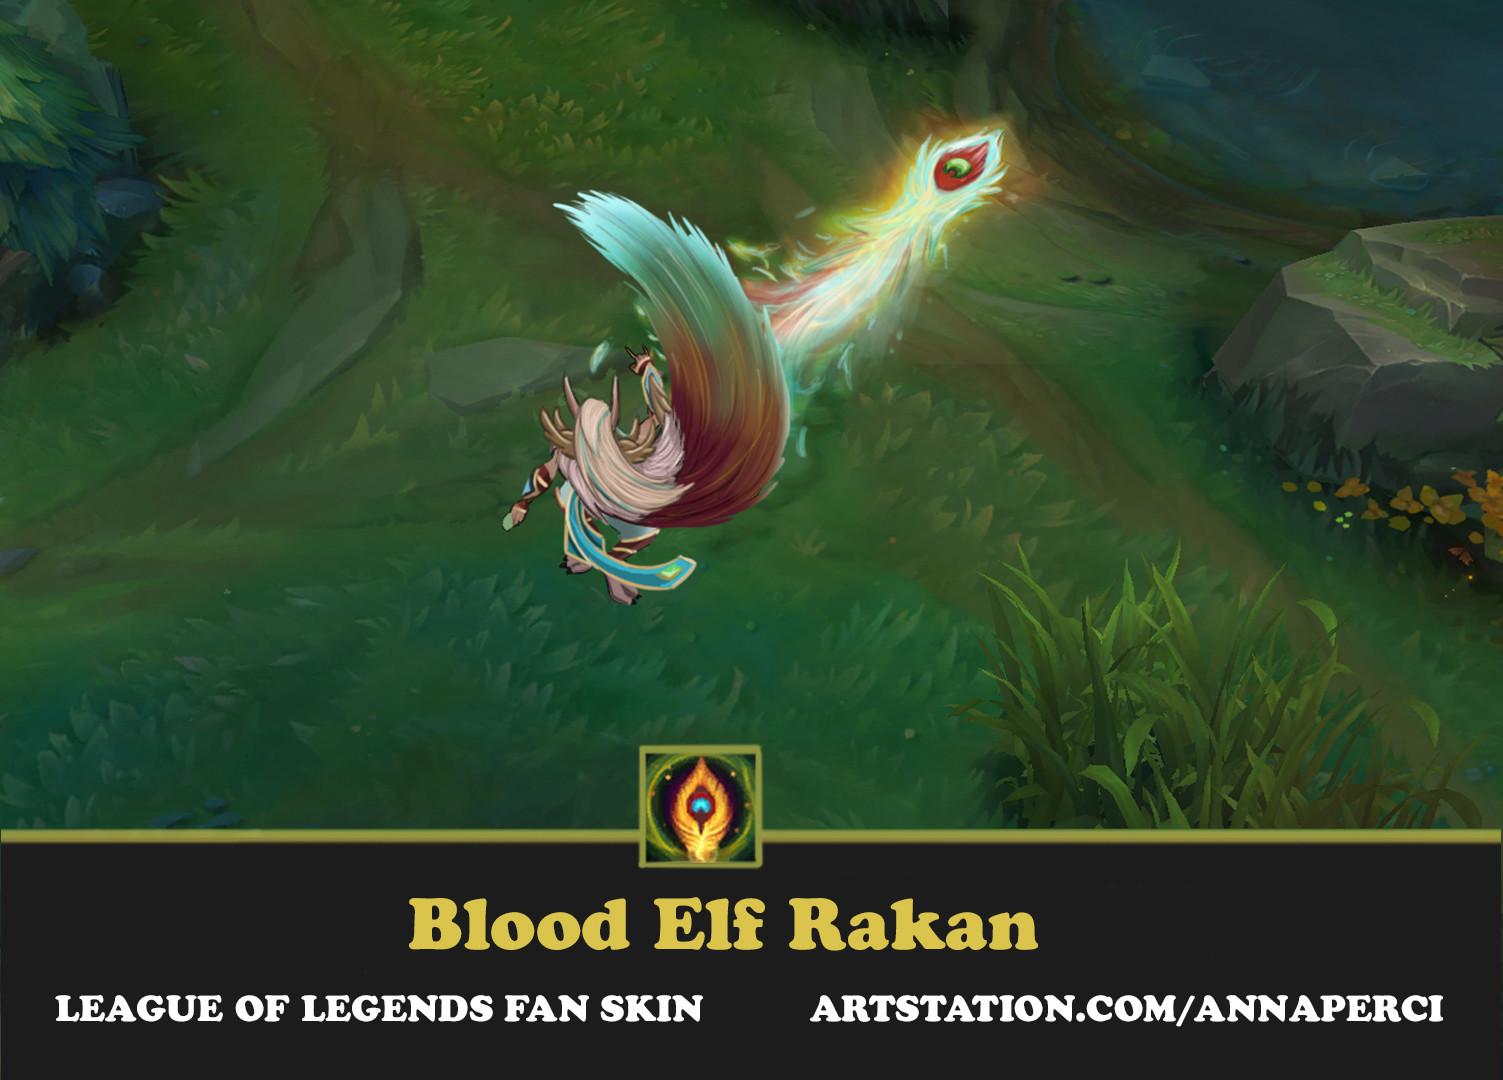 Blood Elf Rakan